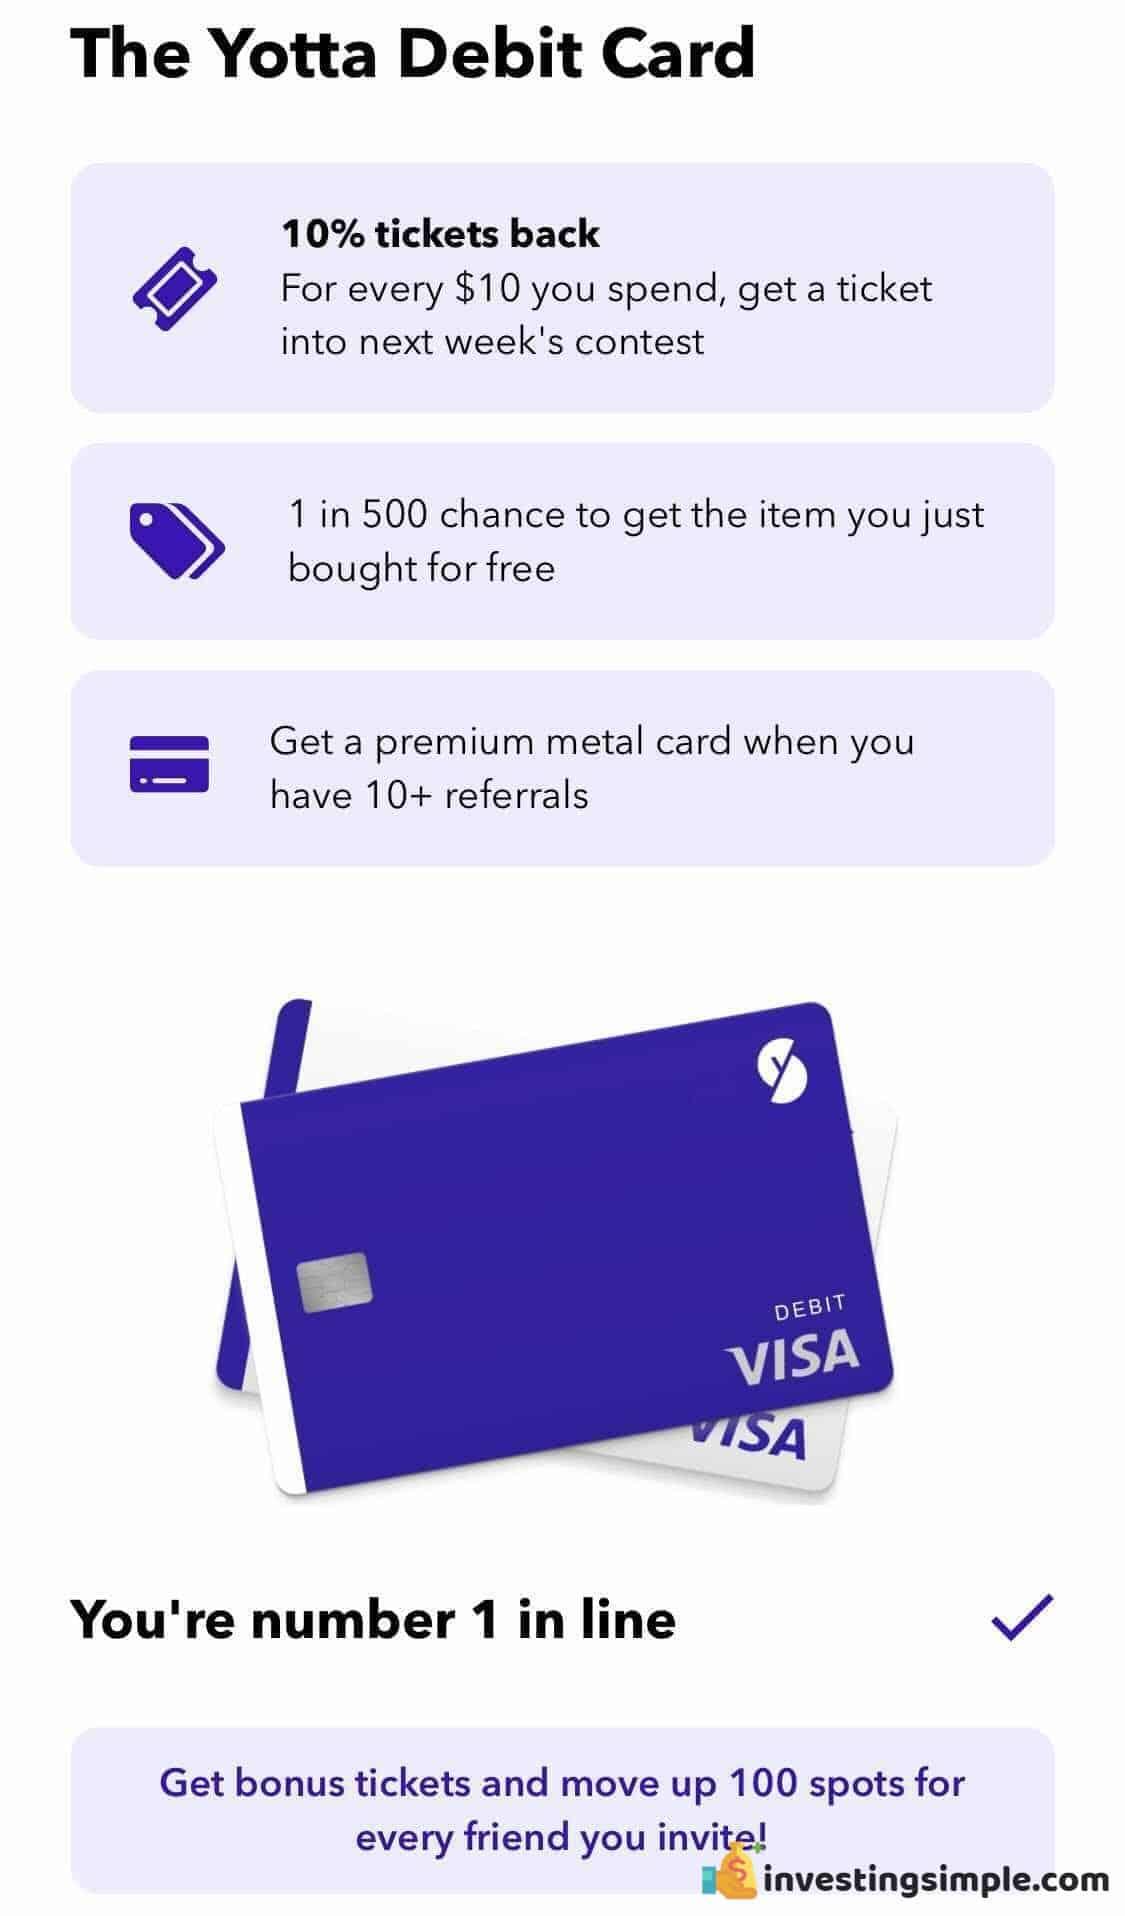 Yotta Debit Card